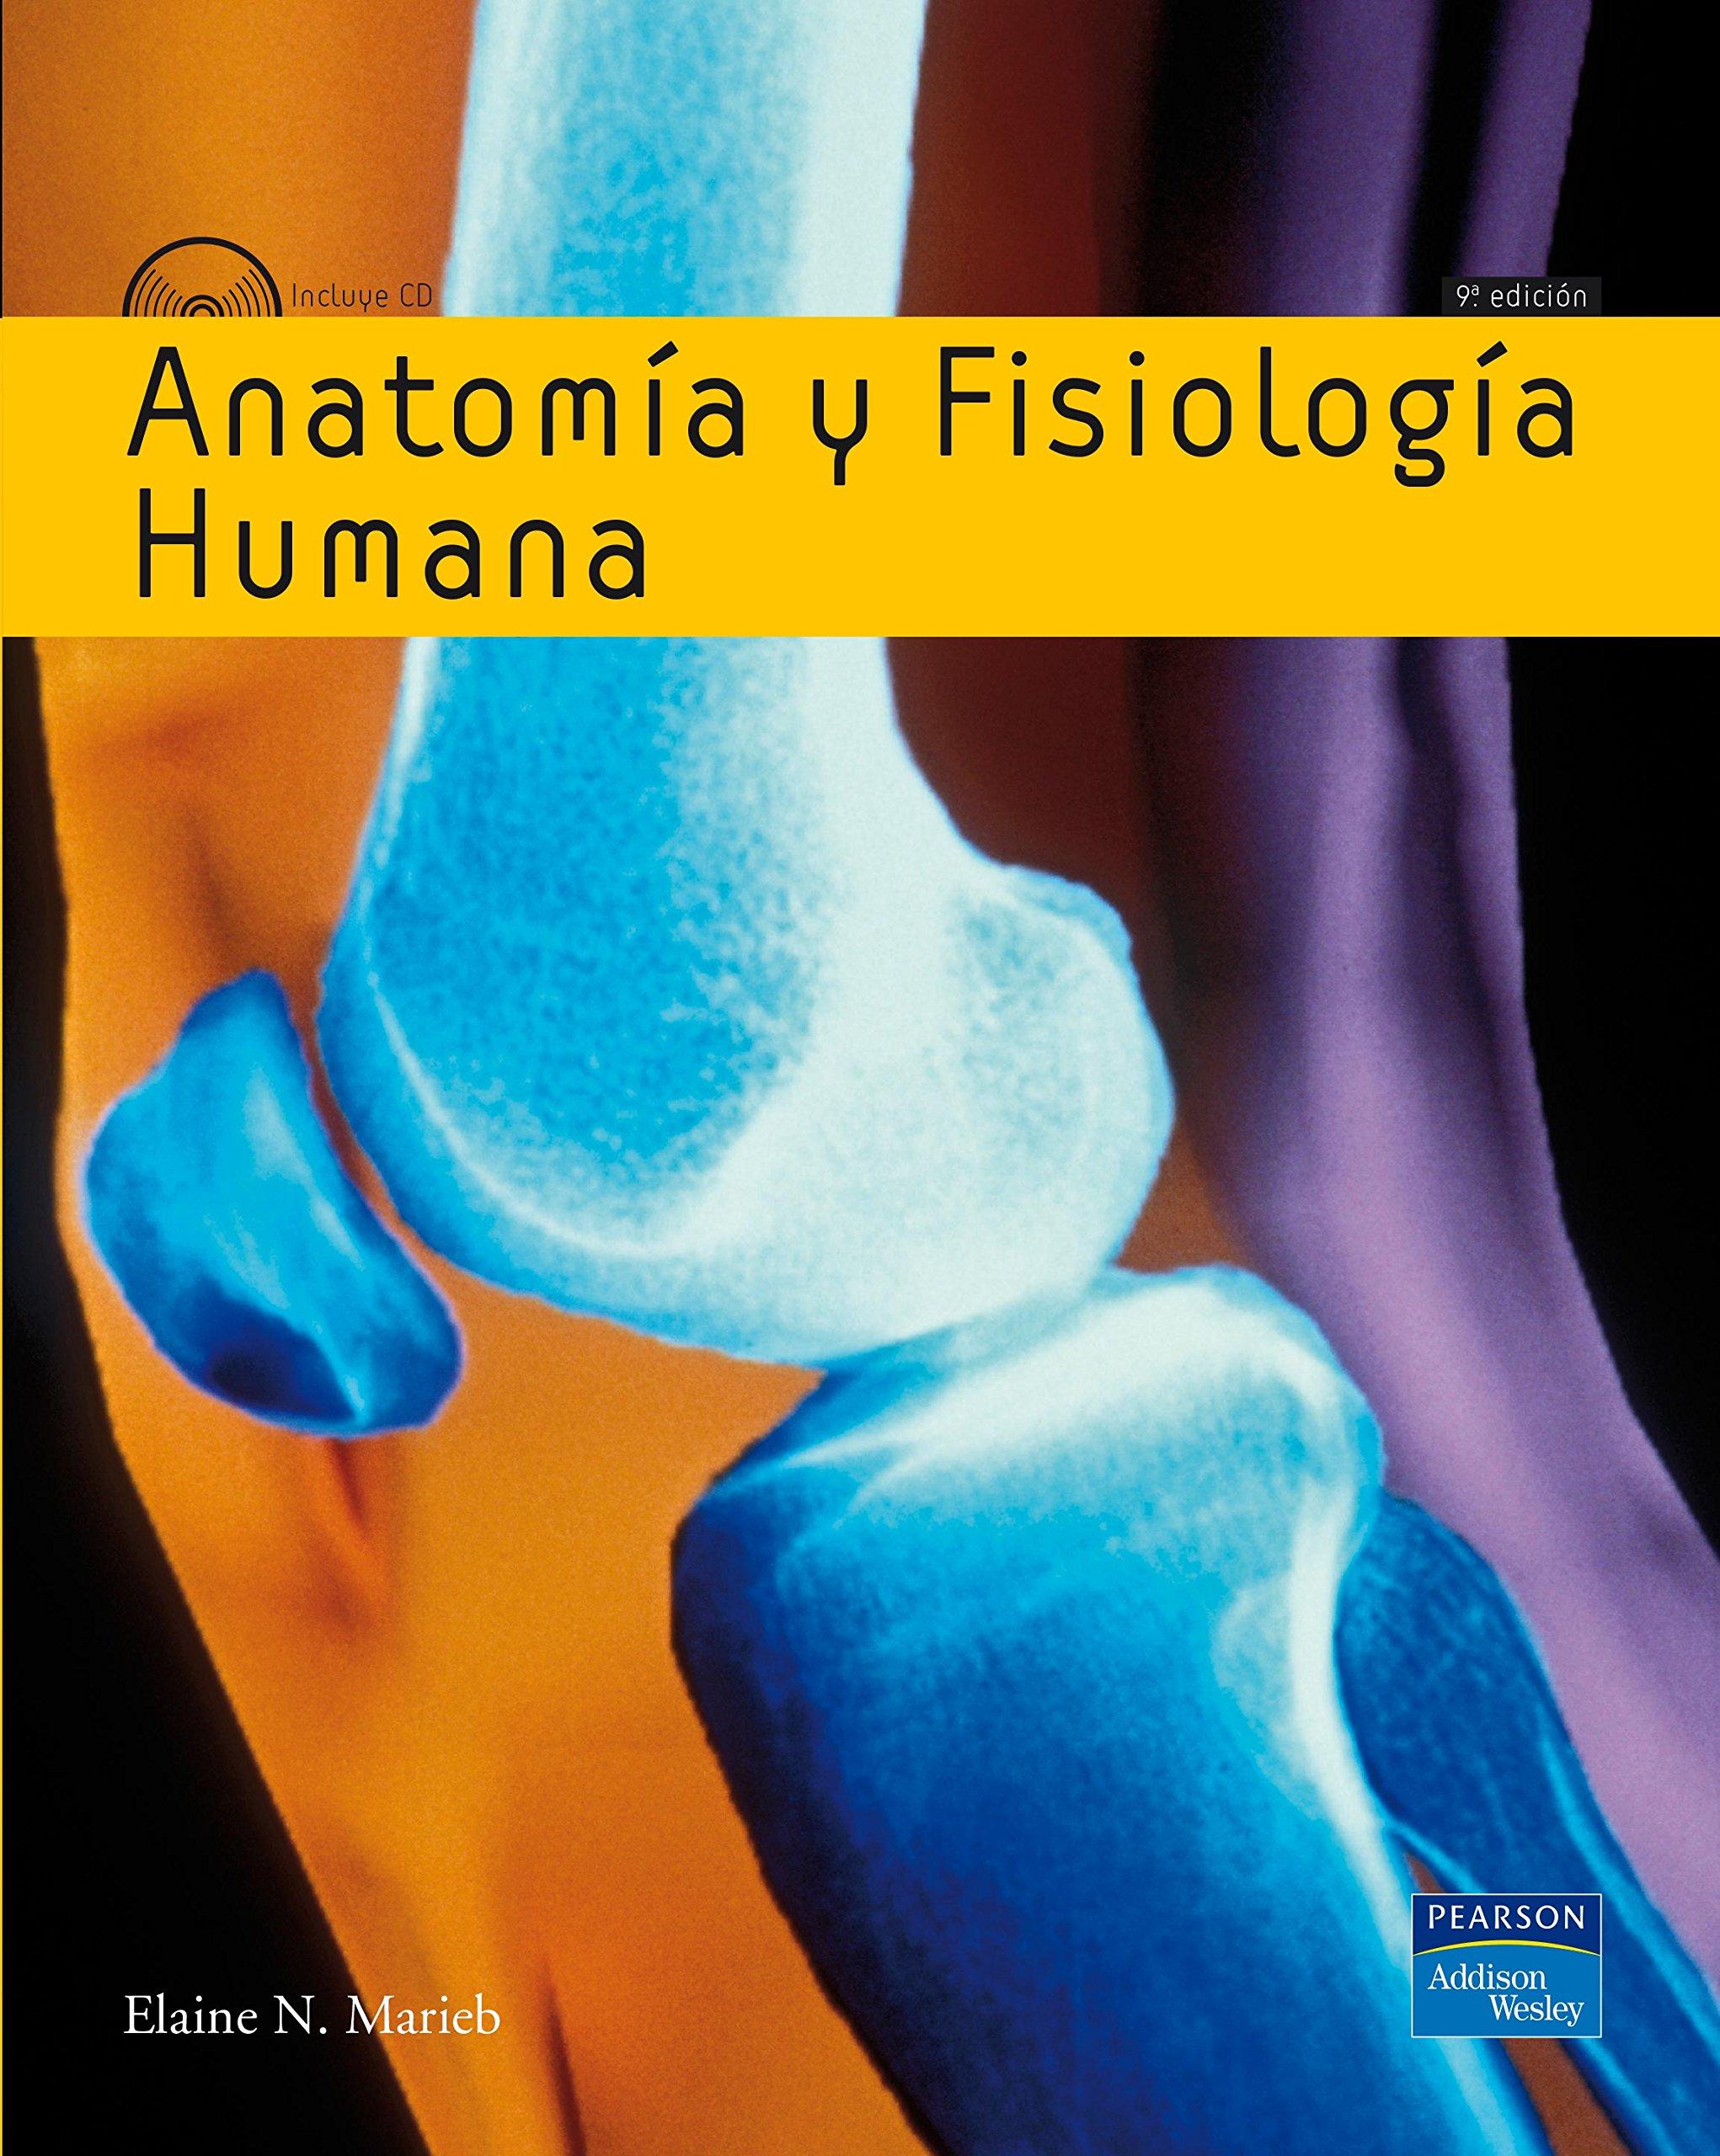 Anatomia y Fisiologia Humana (Anatomia y Fisiologia Humana): Elaine ...